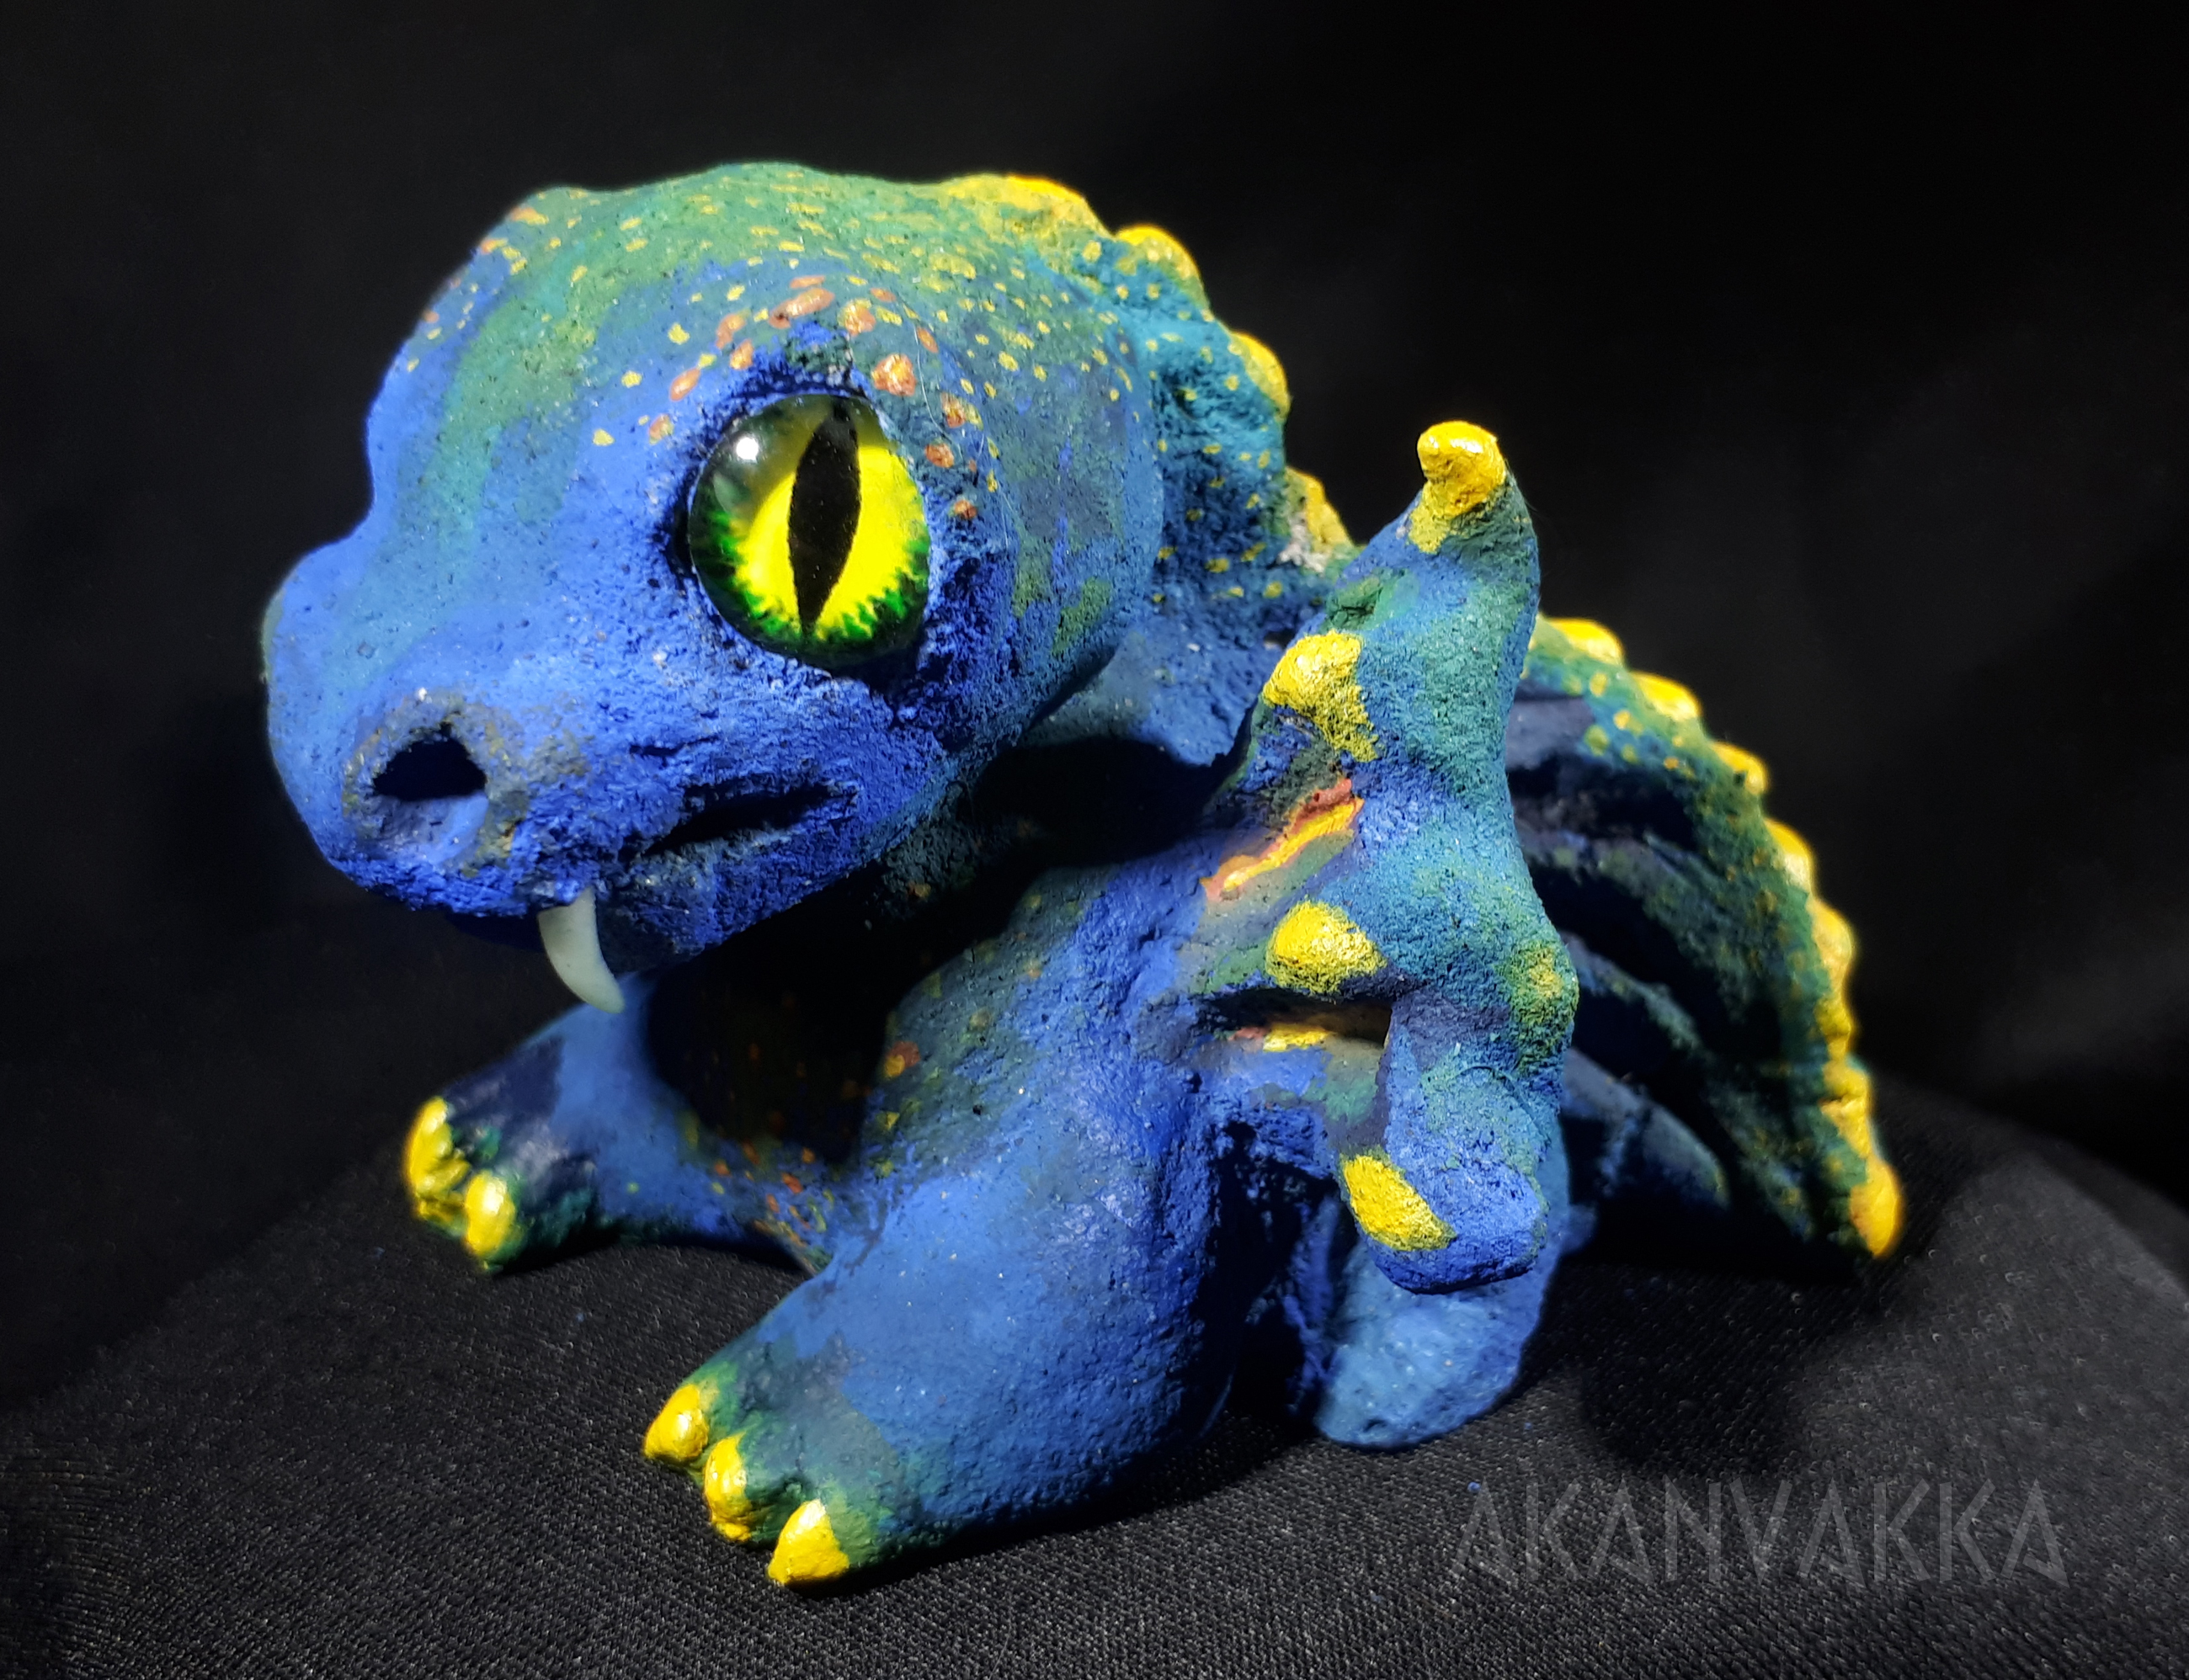 Lohikäärme munassa - Dragon in Egg